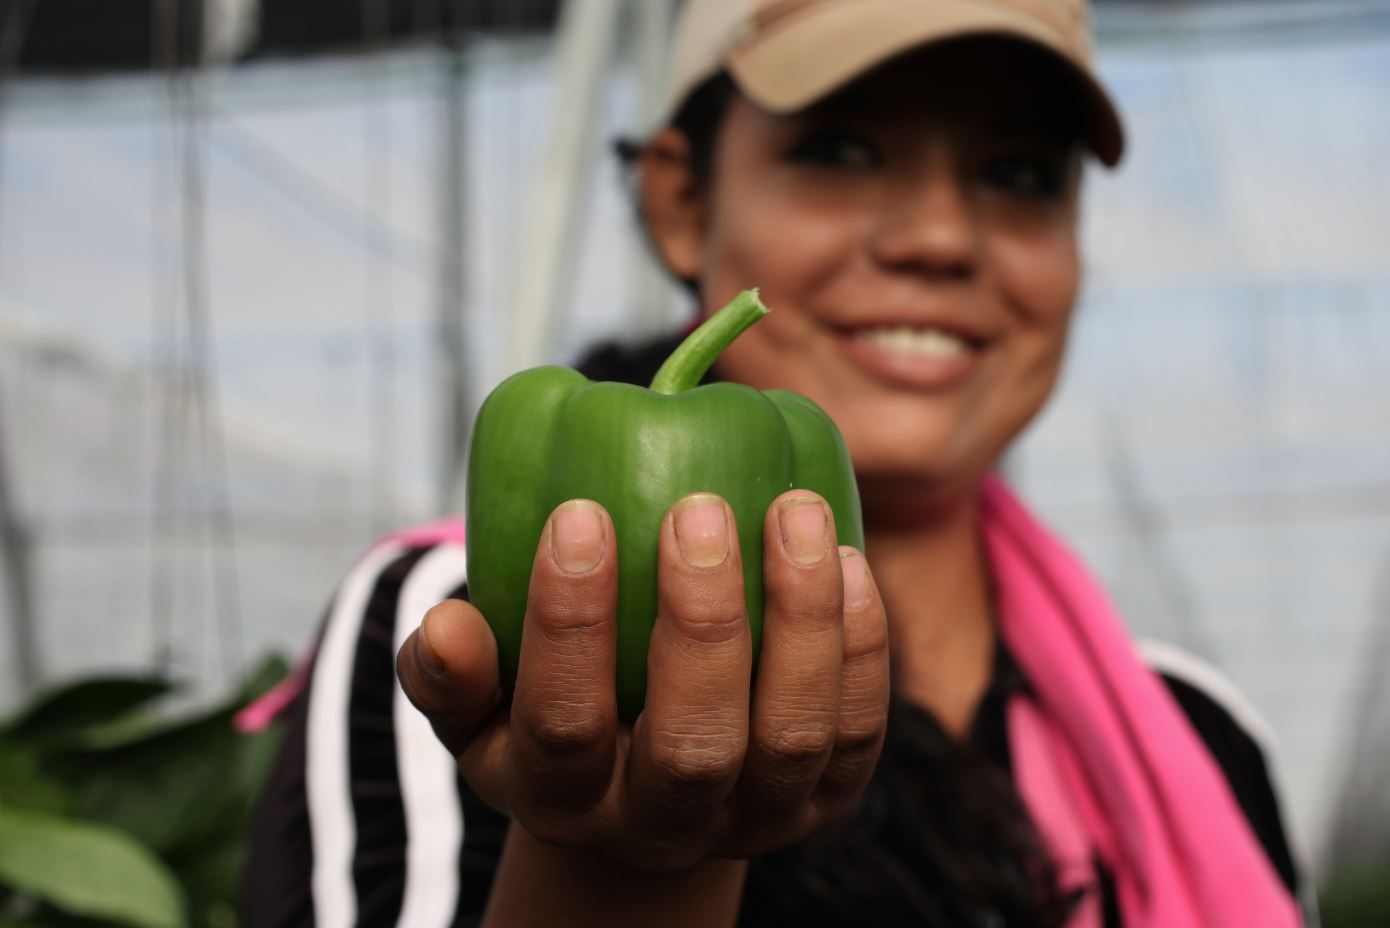 Divemex: Culiacán, Mexico | Erika Vianey Castillo Ramirez, 20, from Ejido Liertad, Sinaloa, holds a Whole Trade organic bell pepper.